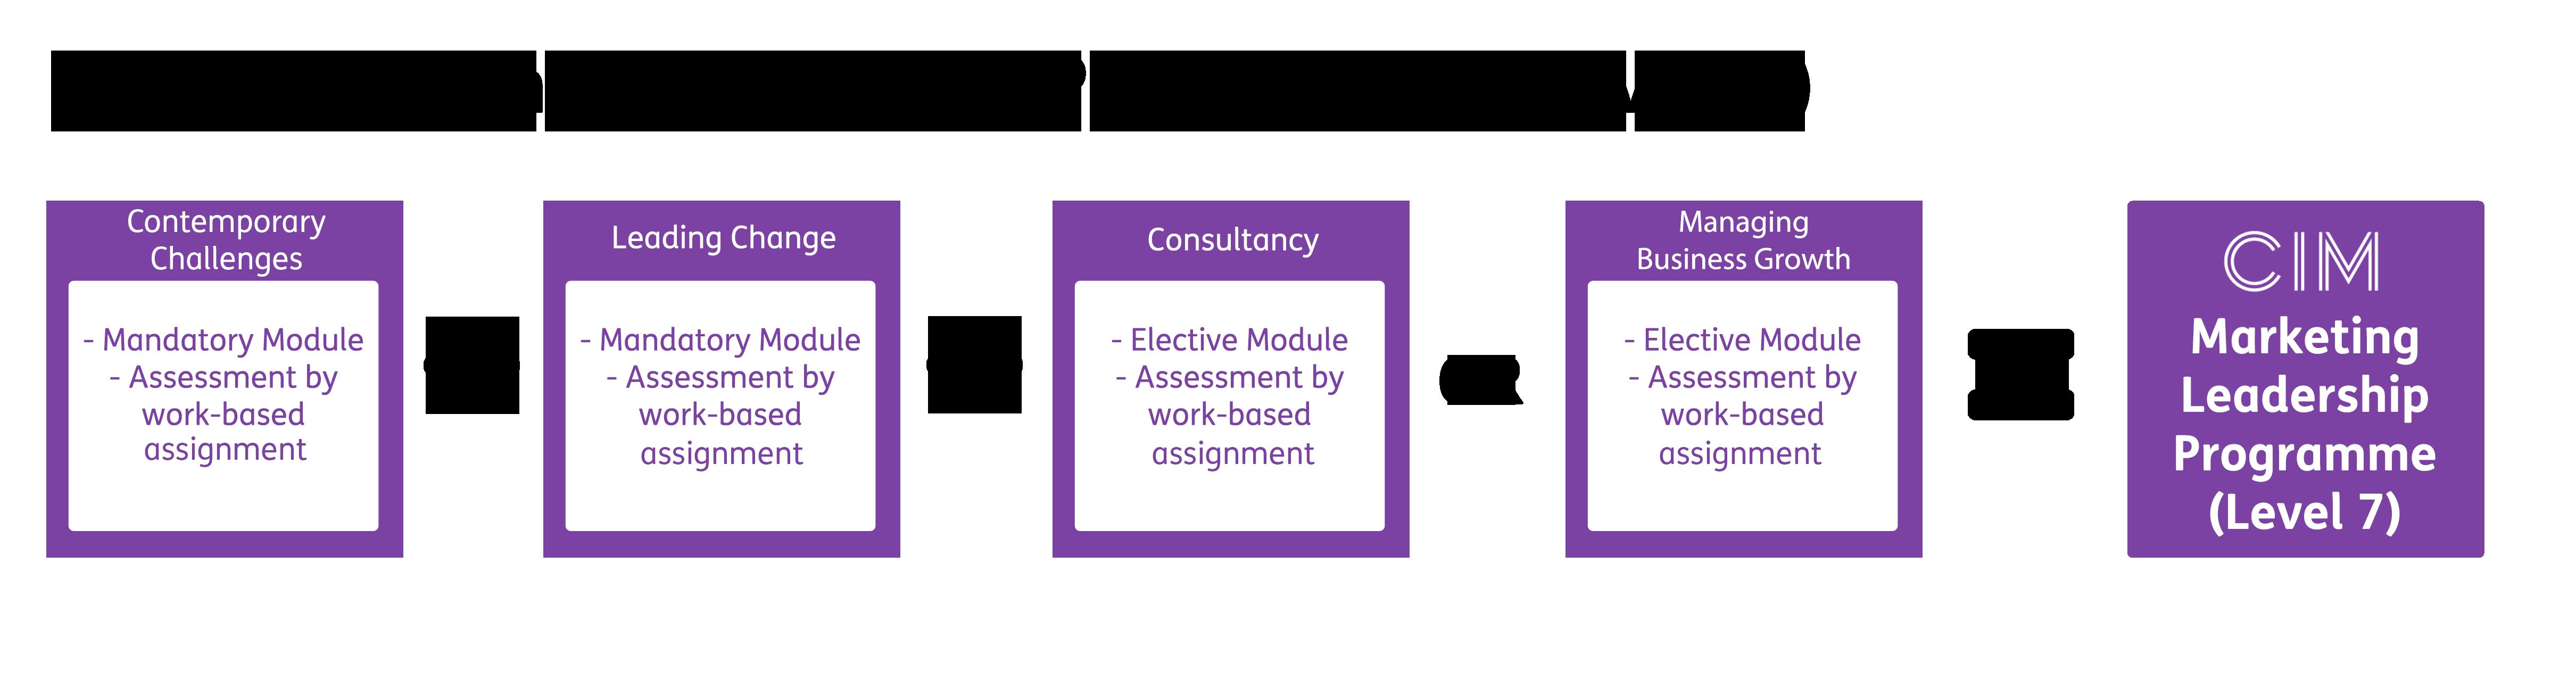 CIM Marketing Leadership Programme Qualification Structure